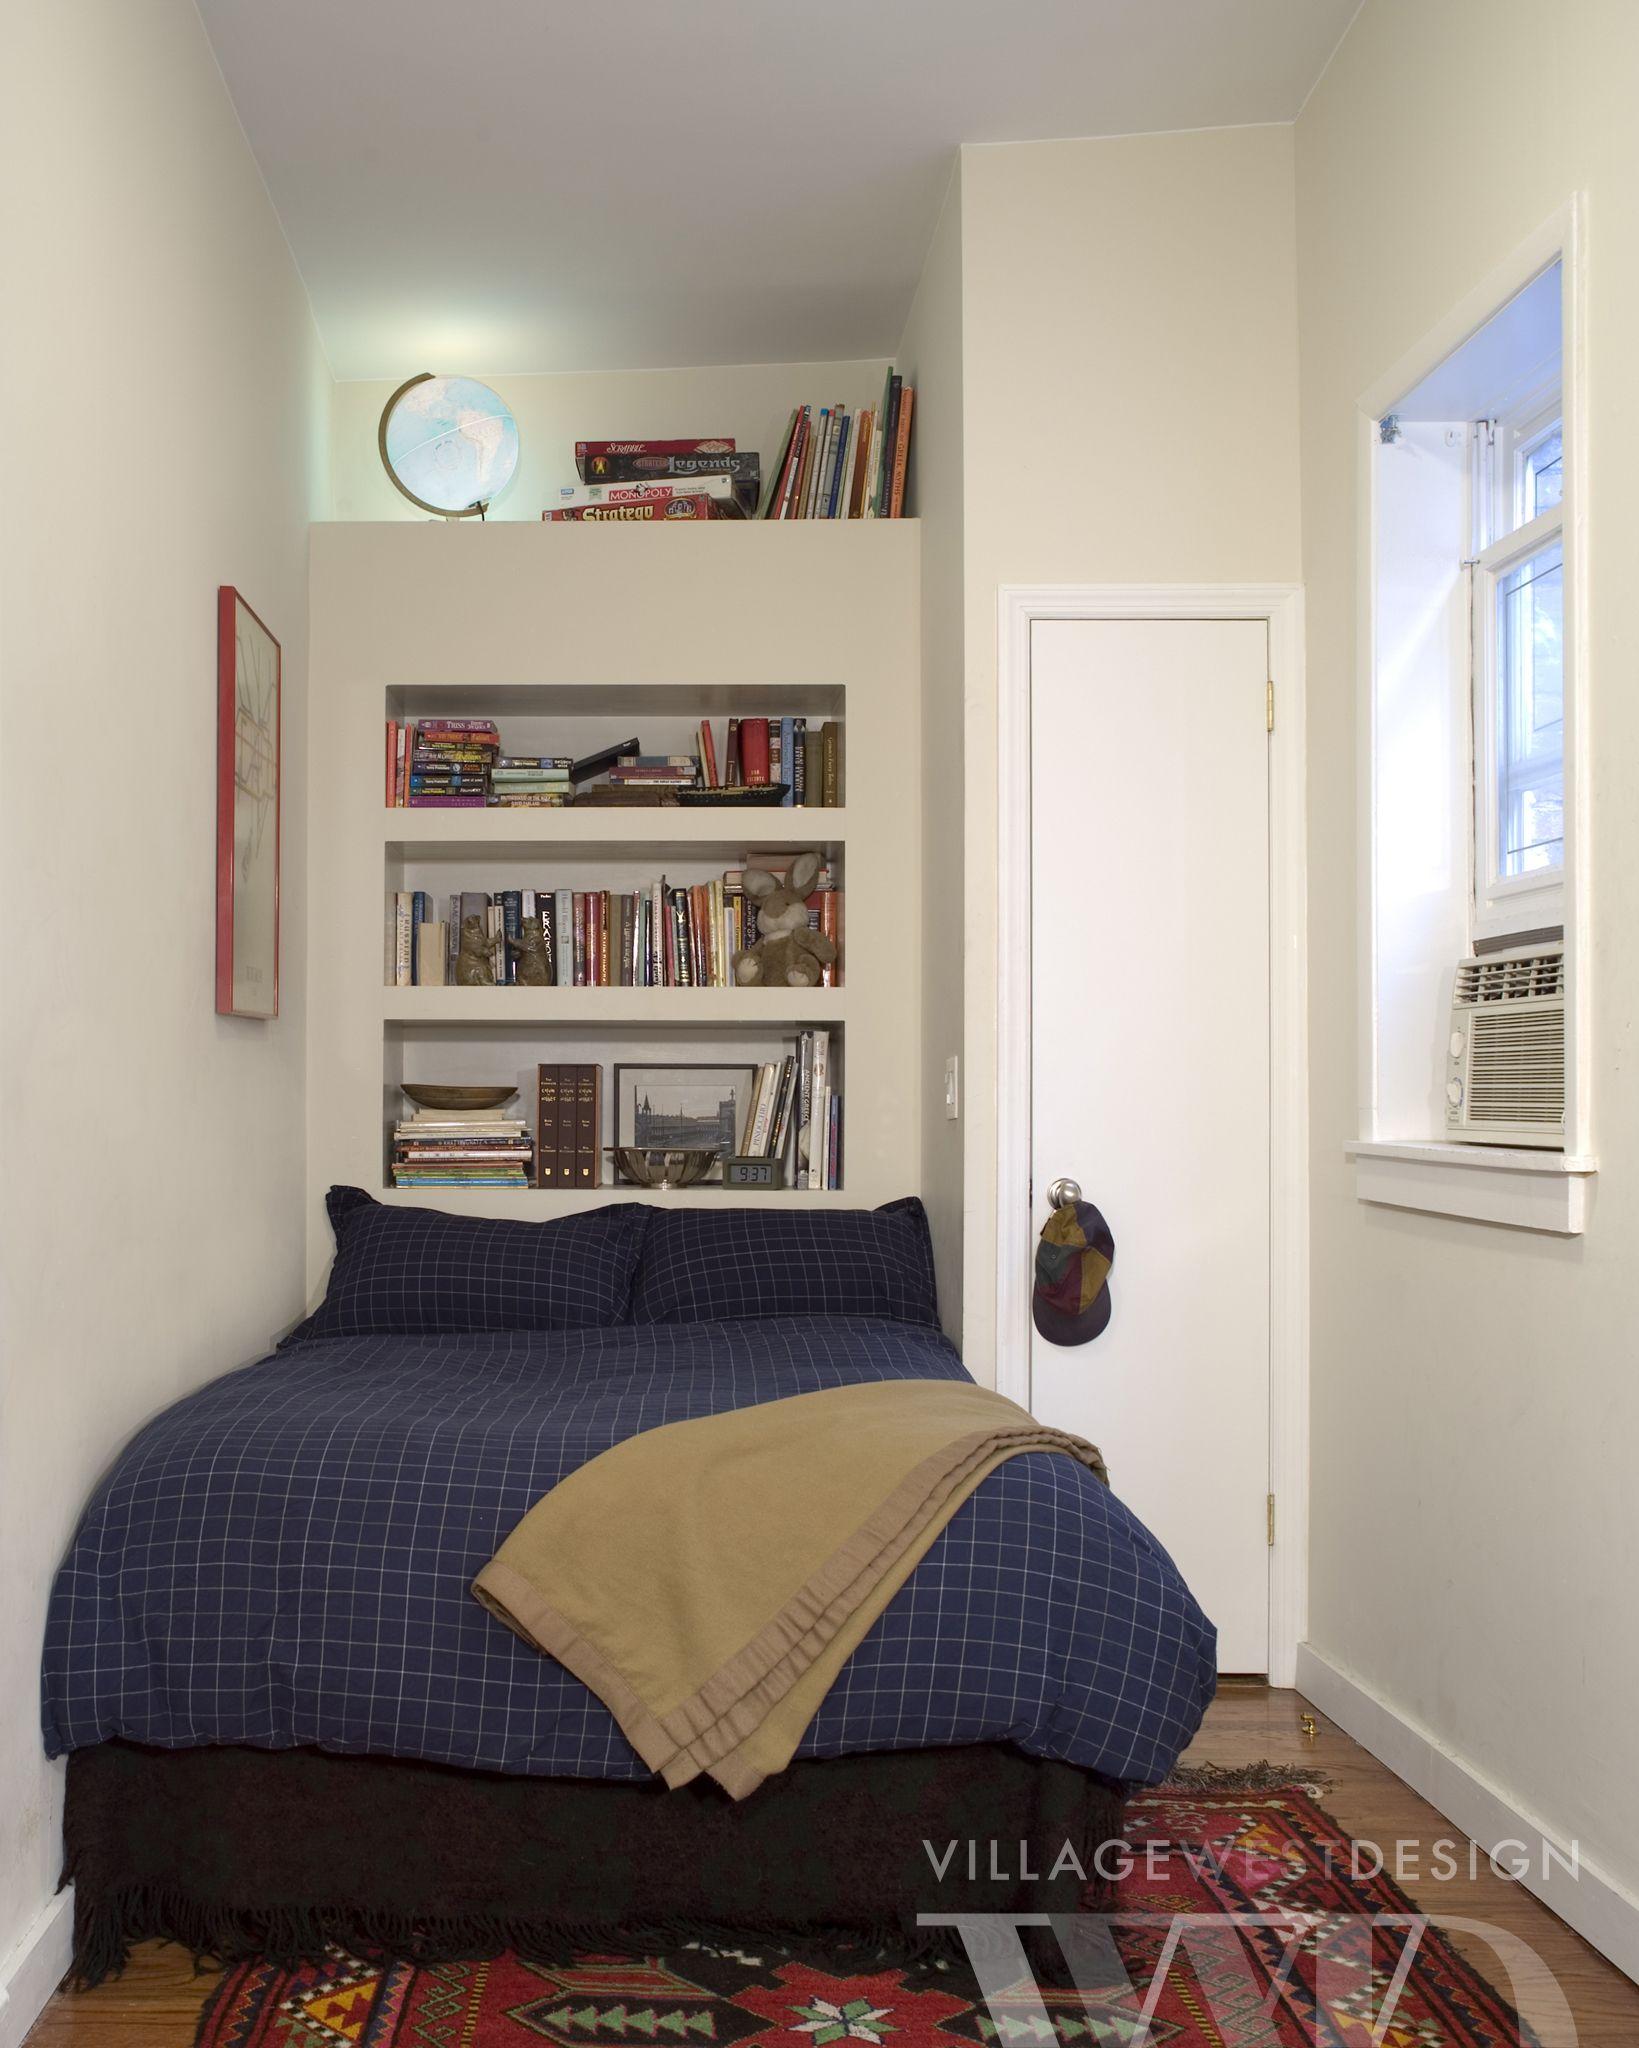 Bedrooms | Village West Design | Small bedroom decor ...